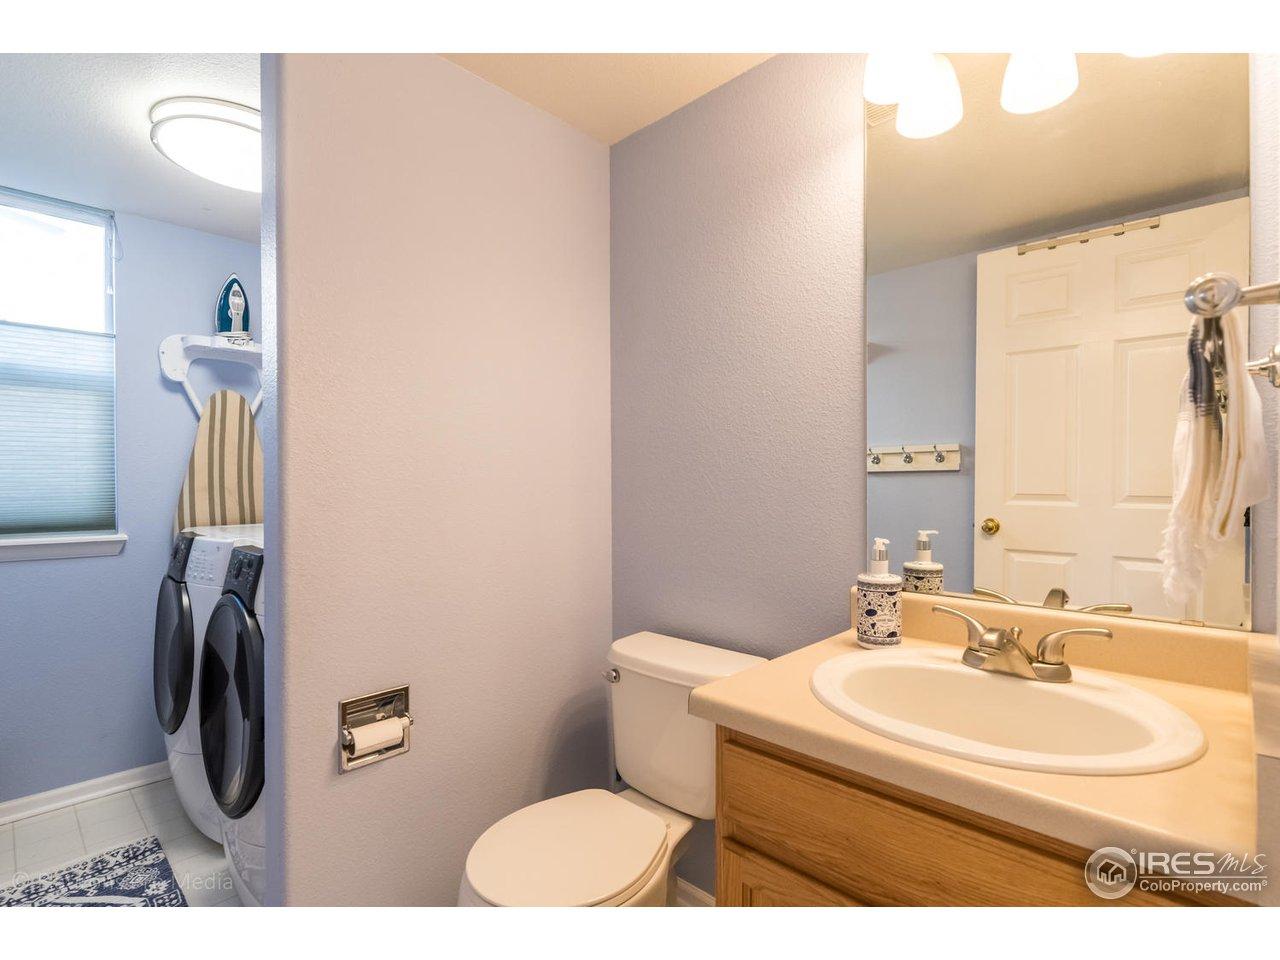 Half bath and Laundry room